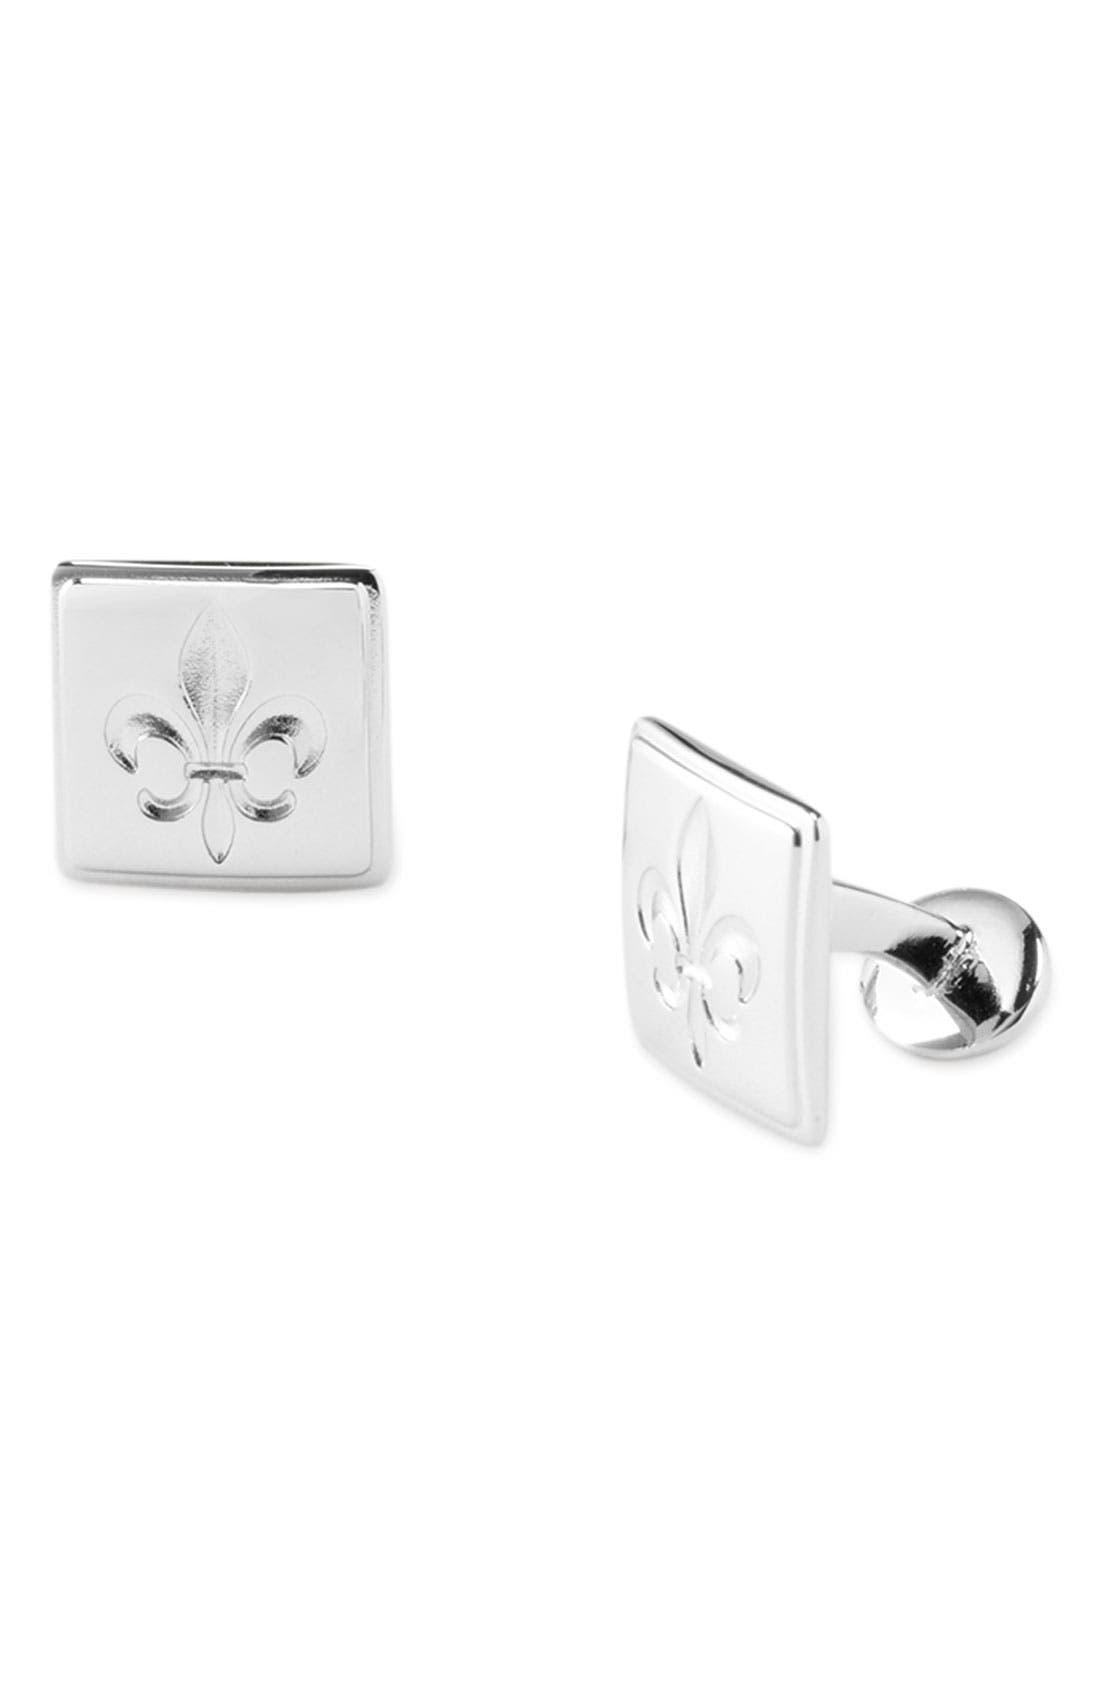 Main Image - David Donahue 'Fleur de Lis' Sterling Silver Cuff Links